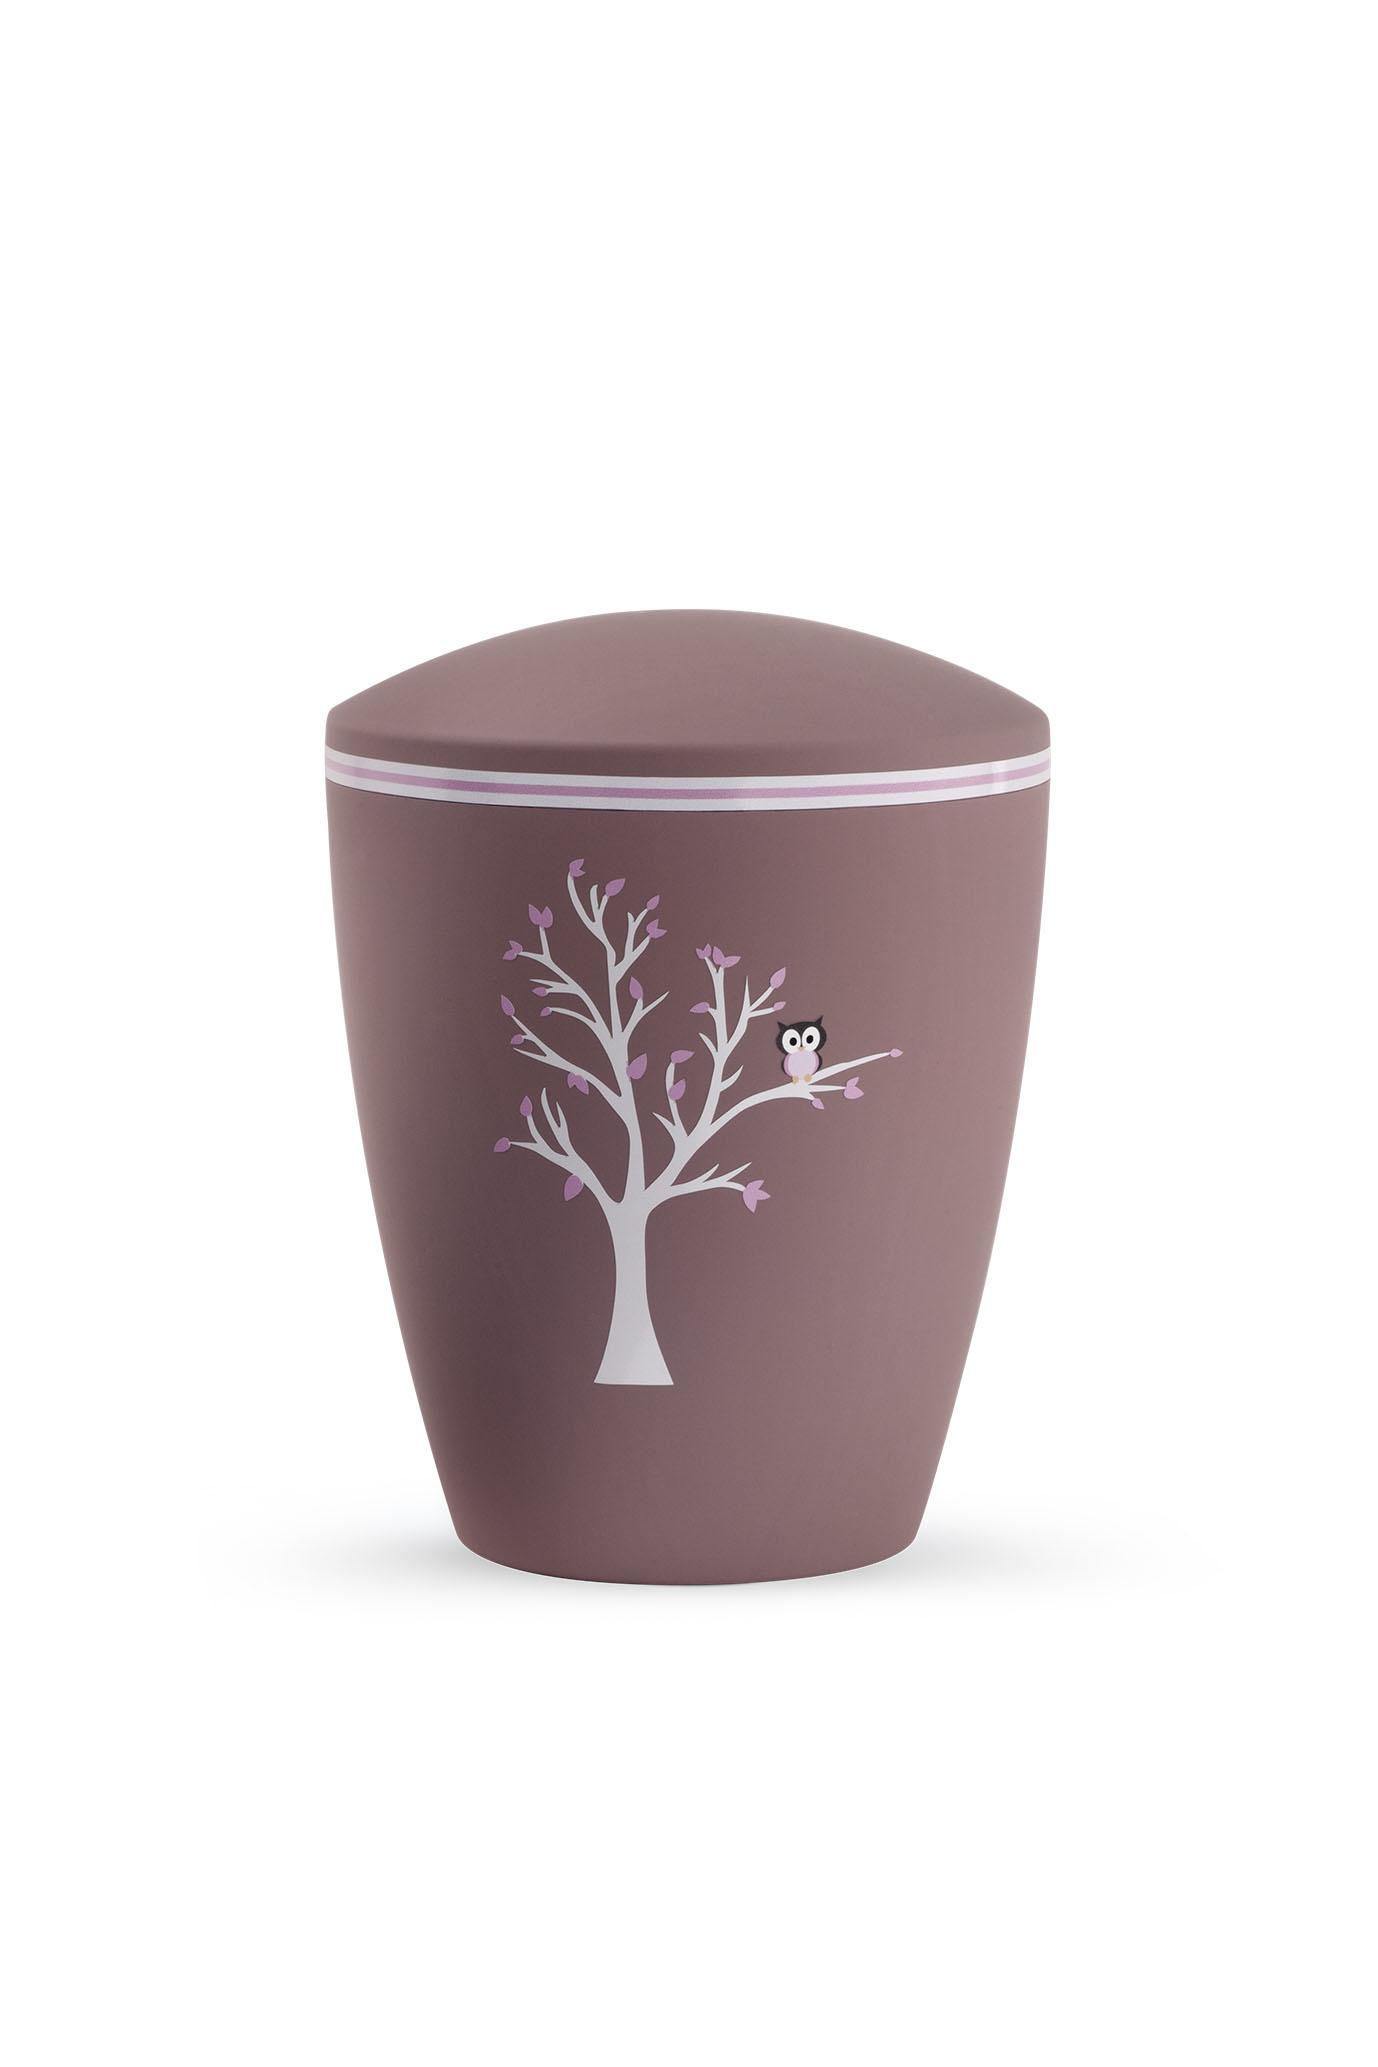 Kinder urn uiltje in boom oud roze - bio